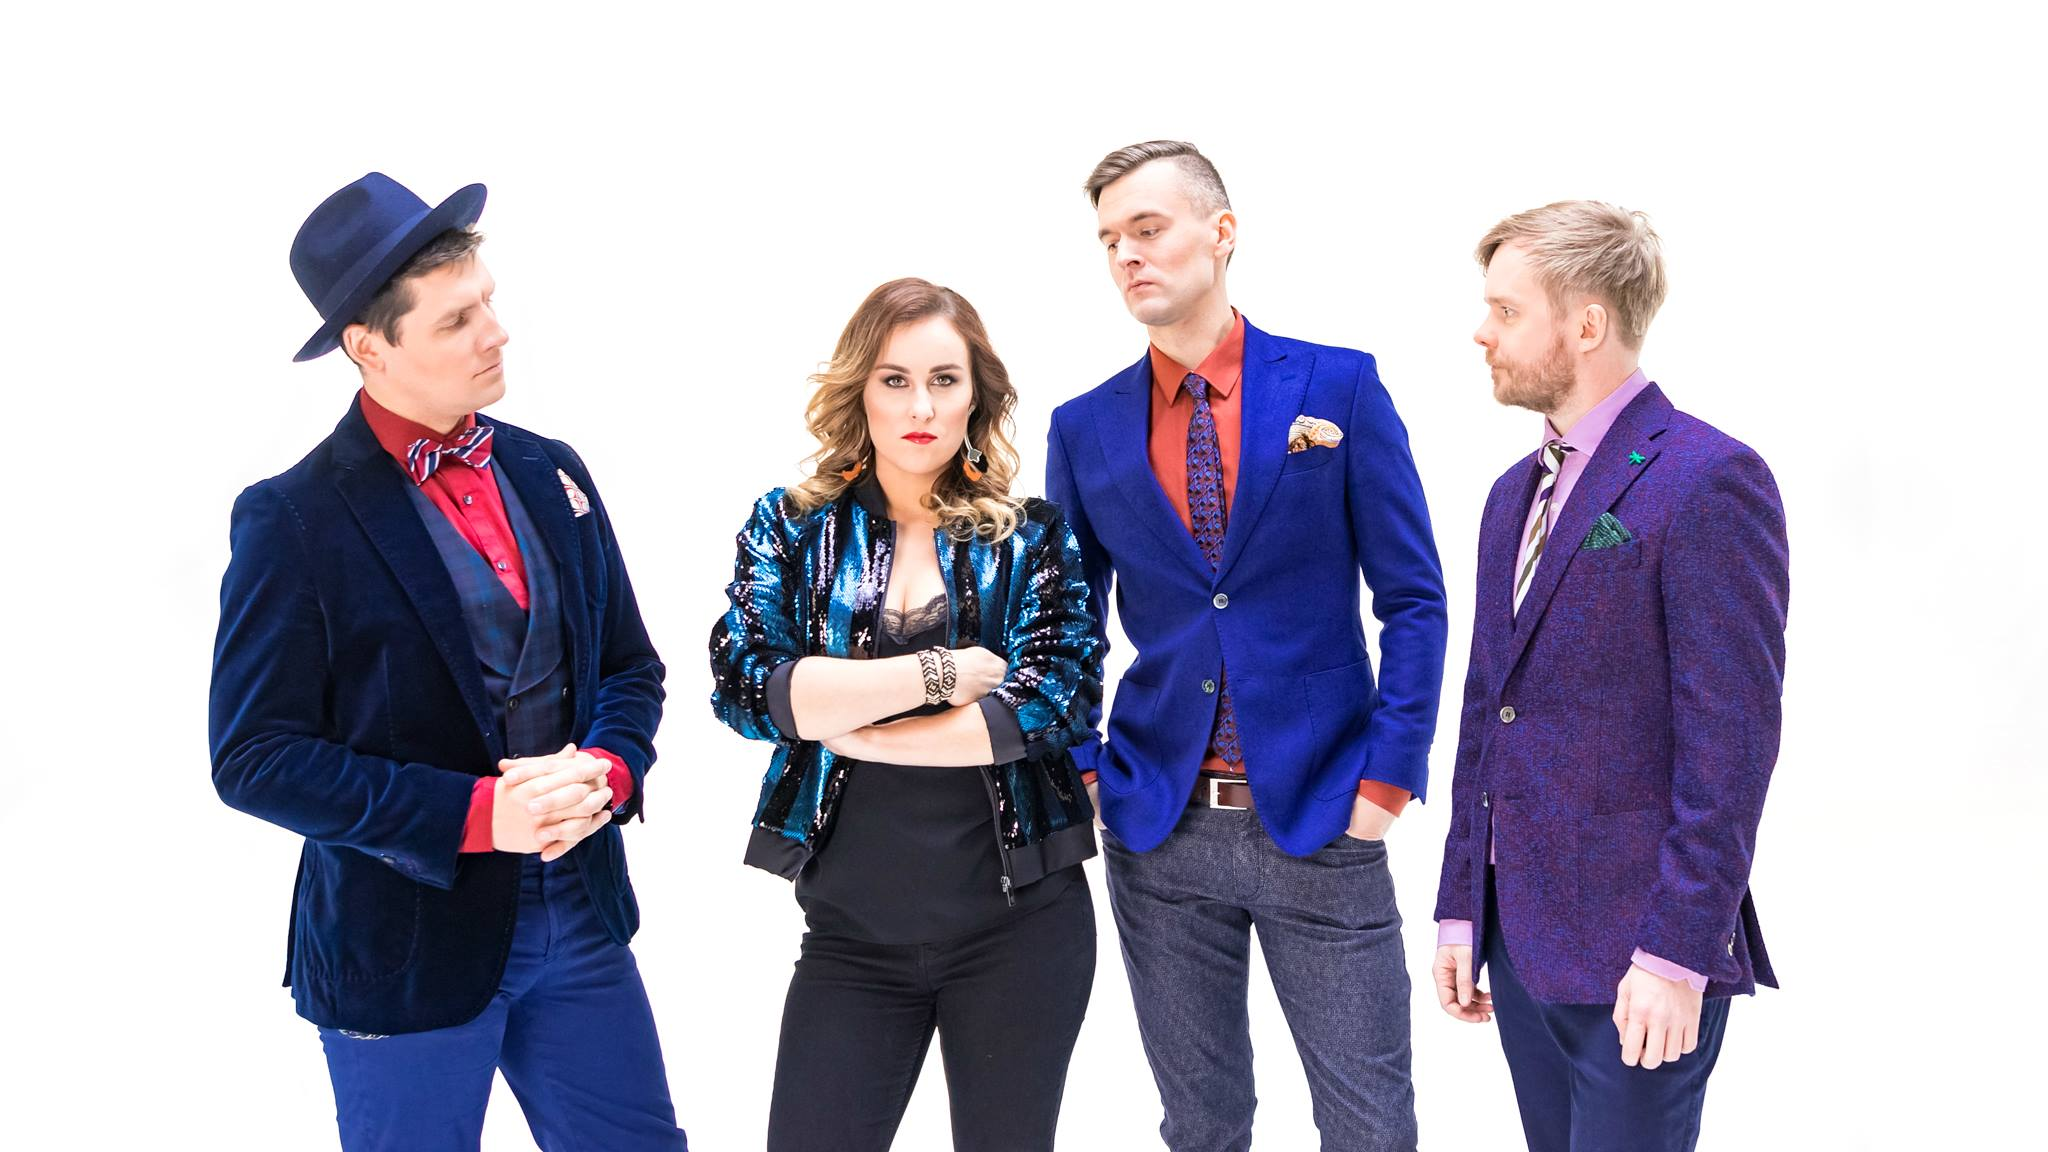 Eesti Laul 2018 Hosts